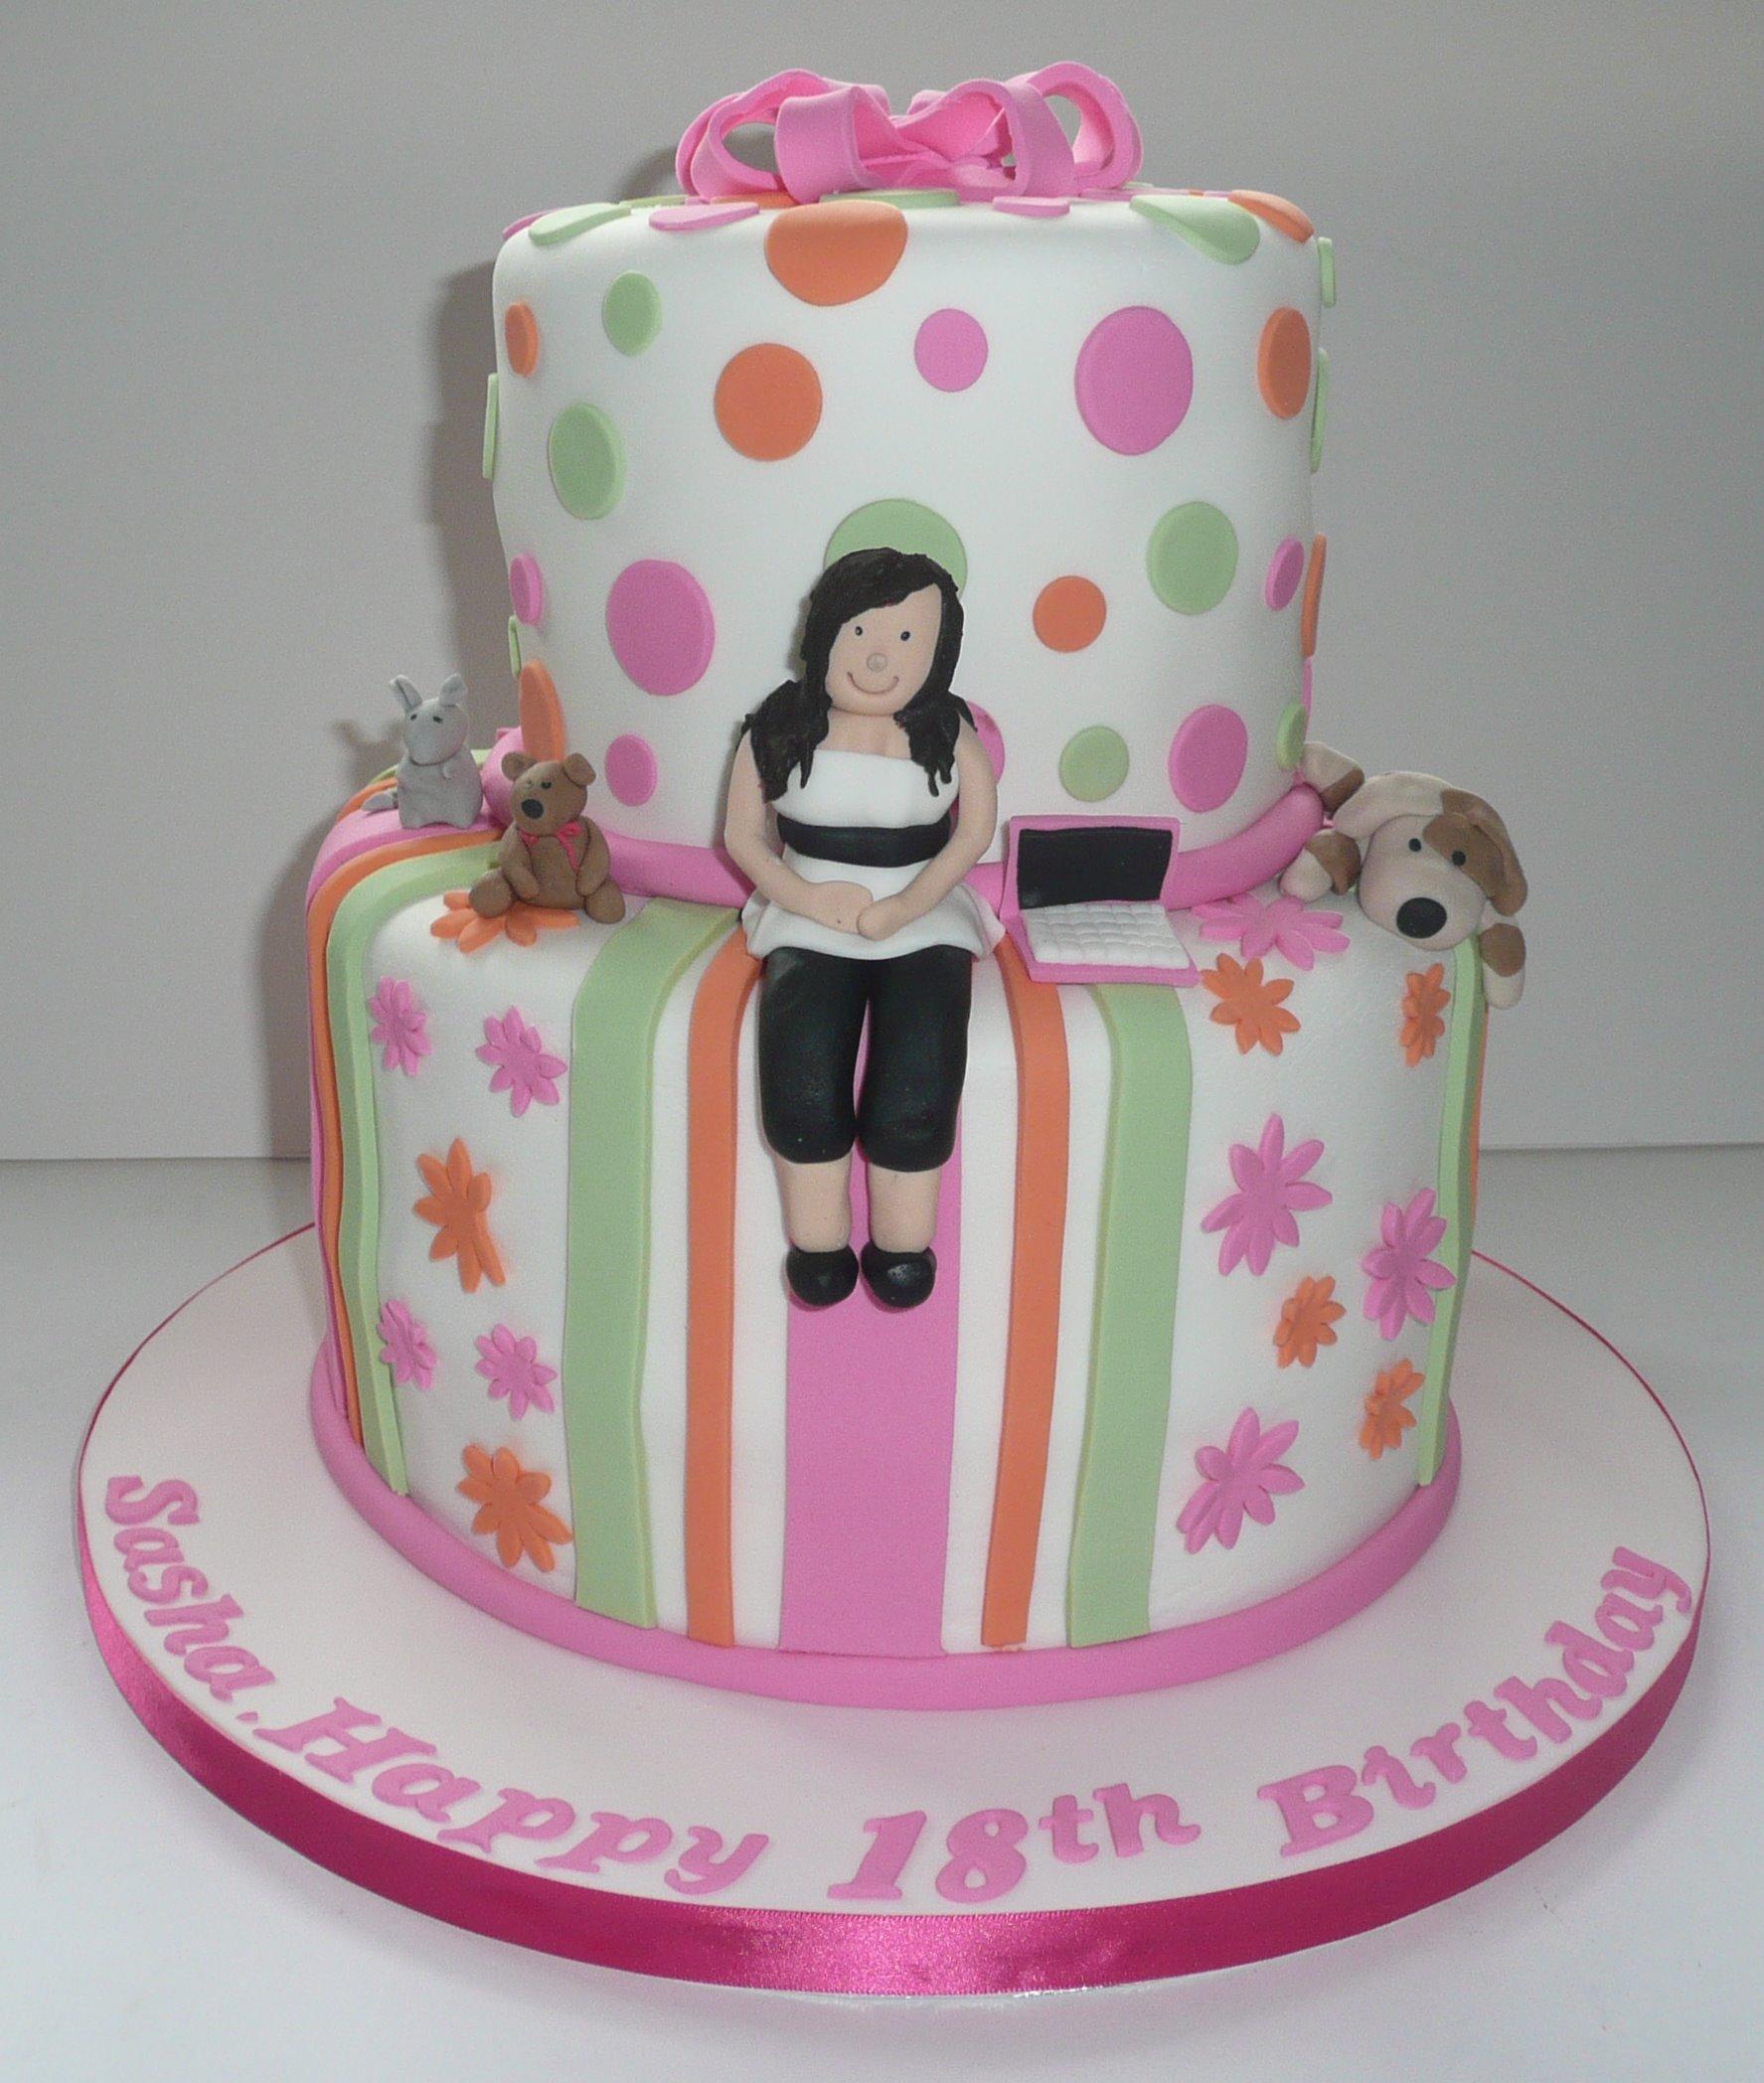 Endearing Girls Name Girls Butterfly Birthday Cakes Girls September 2013 Cakes Birthday Cakes Tier Birthday Cake nice food Birthday Cakes For Girls